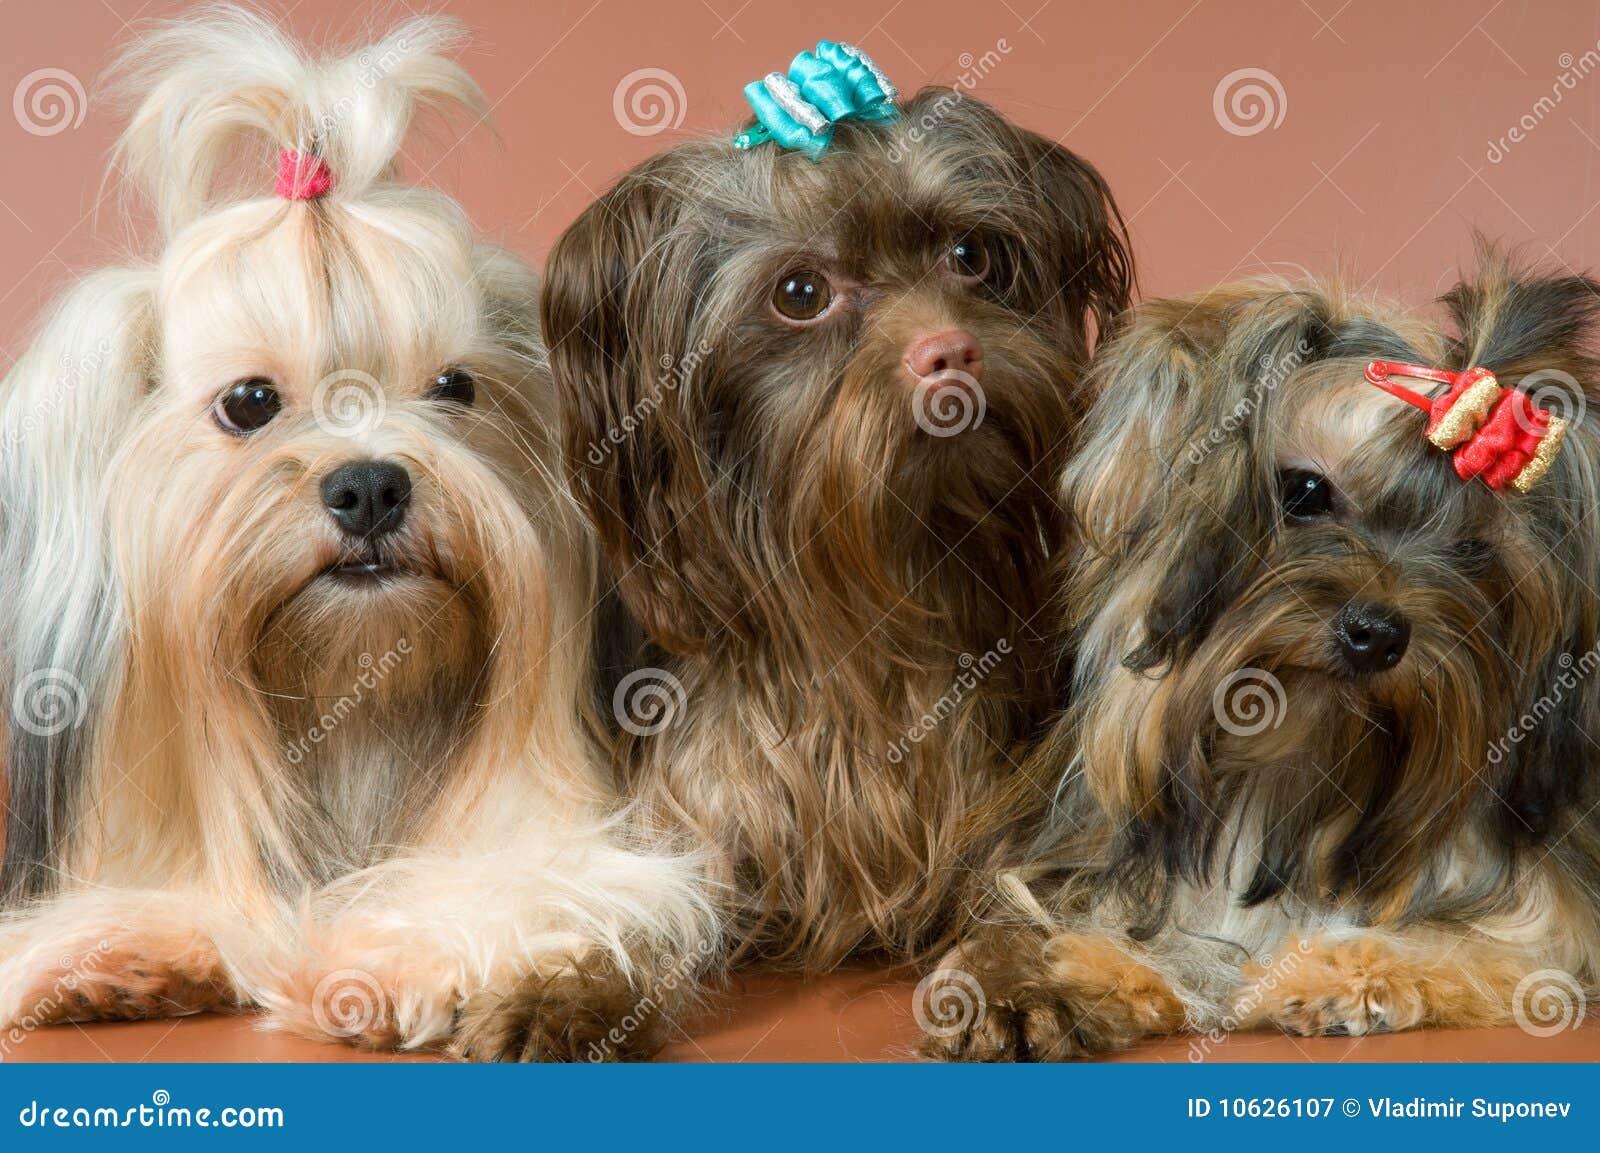 Three lap-dogs in studio